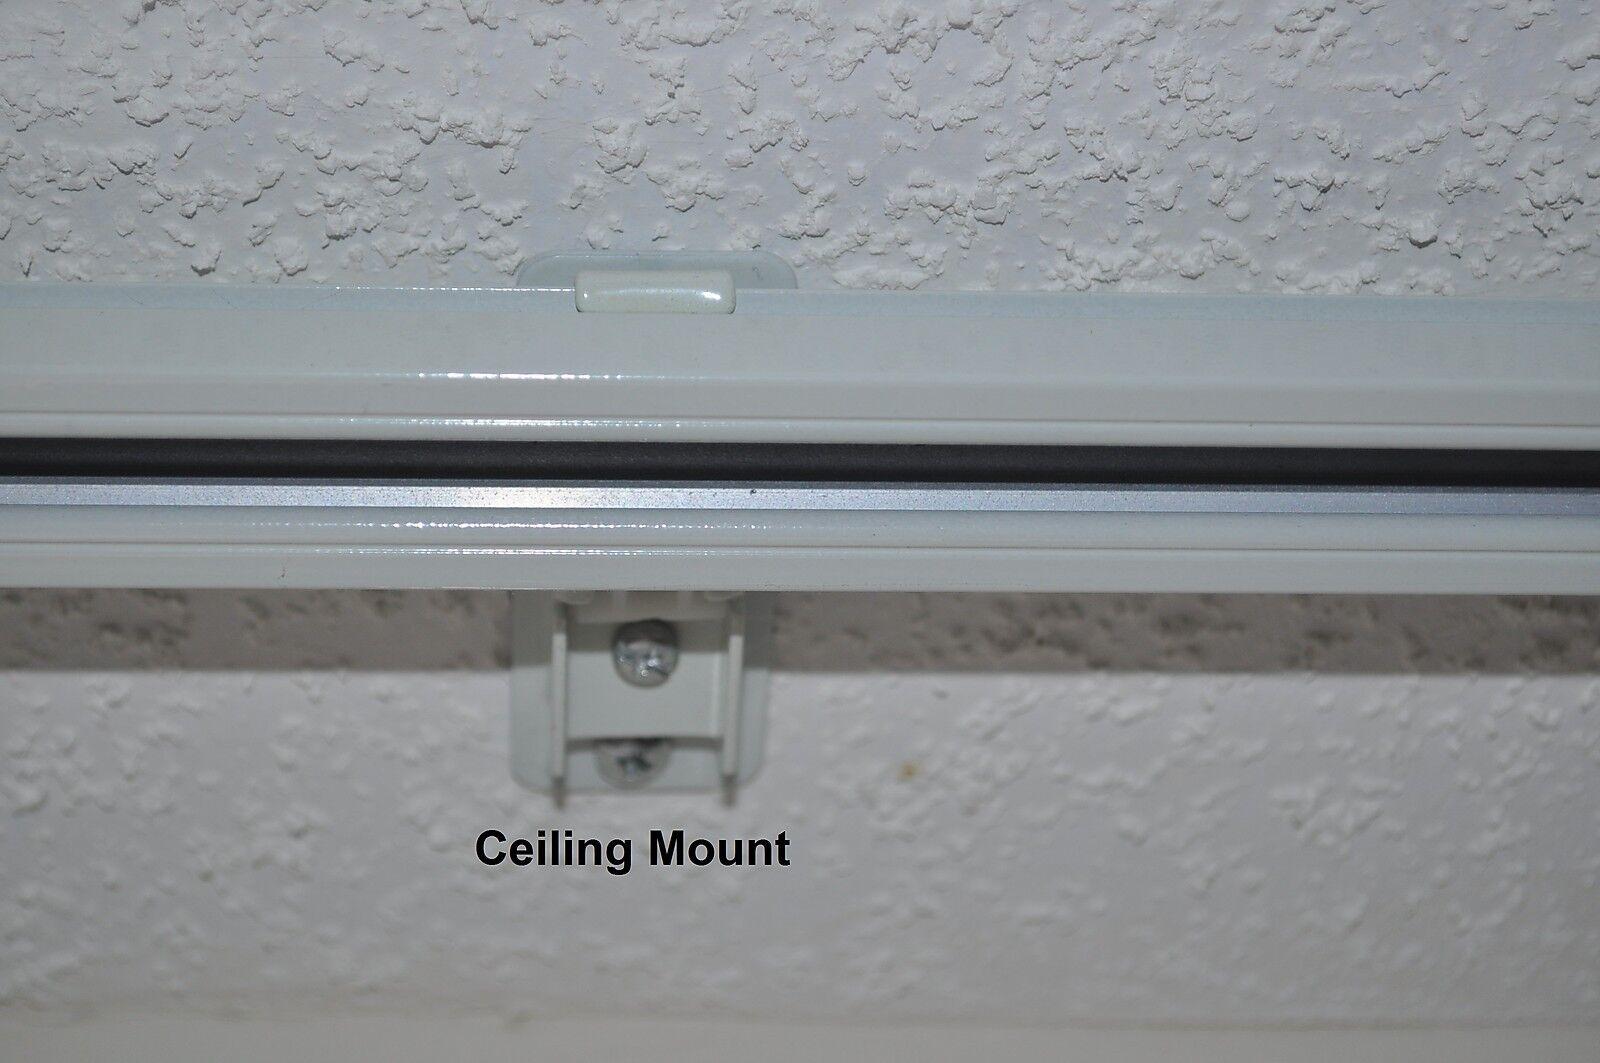 20 39 6m Remote Control Electric Motorized Window Curtain Rod Cad Picclick Ca